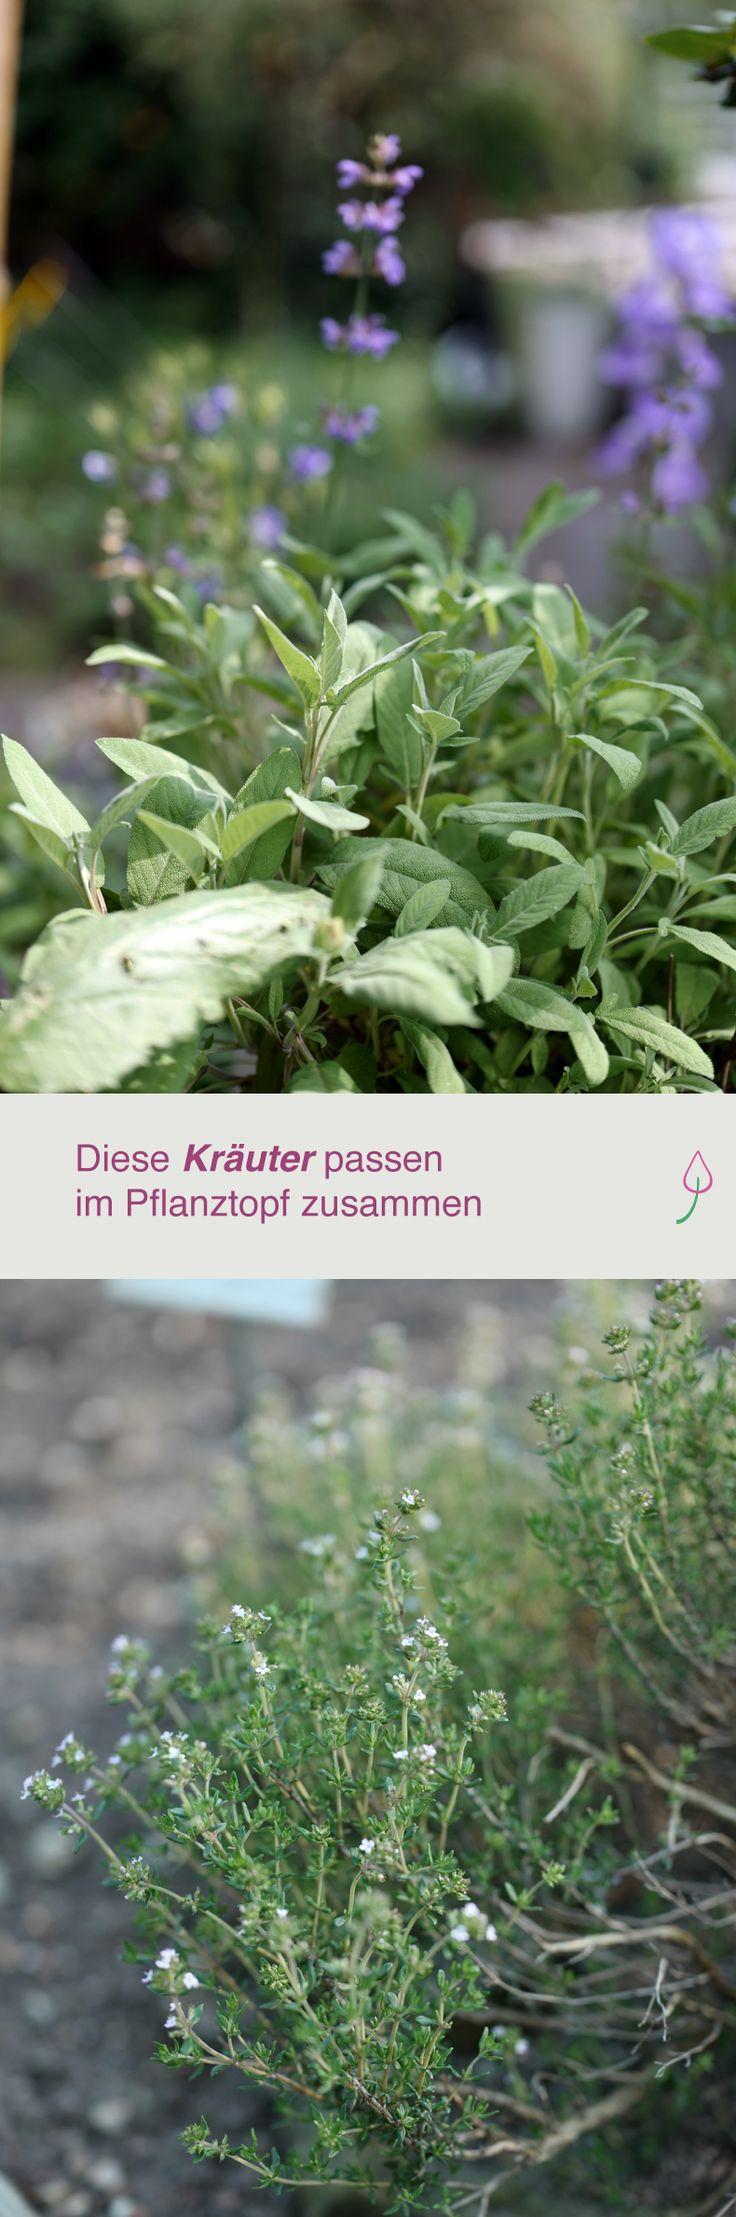 161 besten bildern zu nutzgarten: salat, kräuter, gemüse, obst auf, Gartengerate ideen